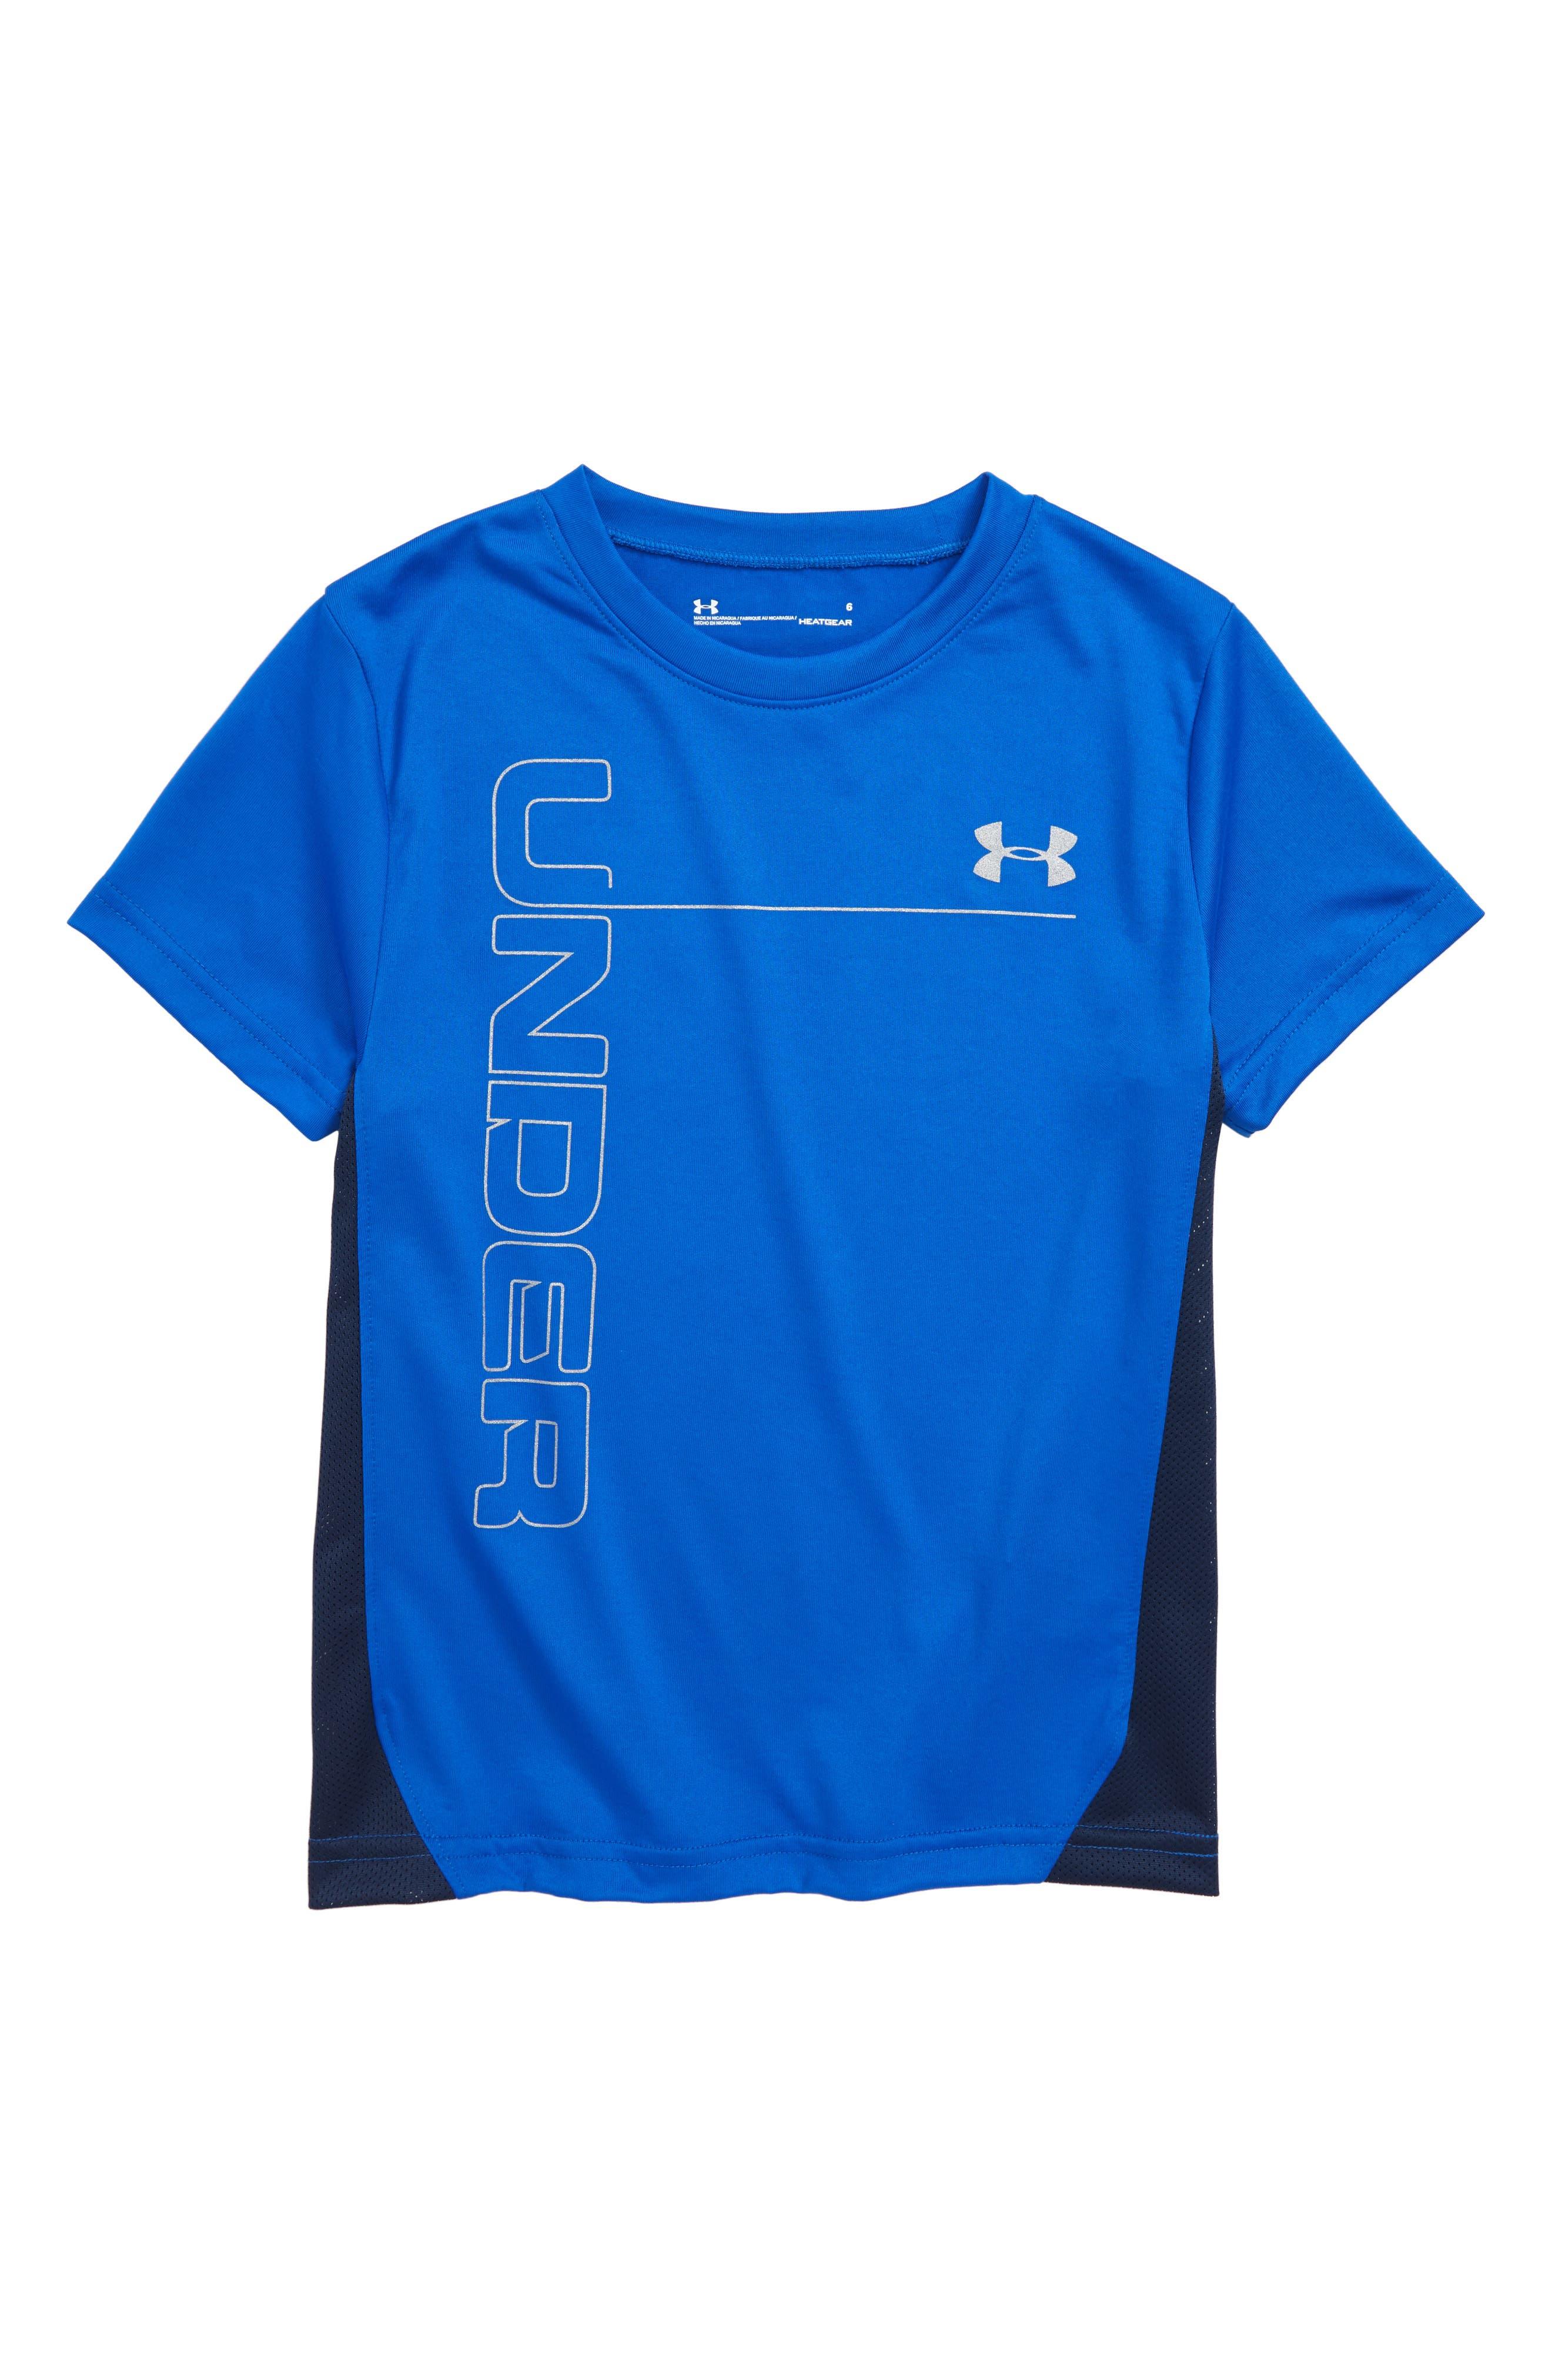 Mesh Tech HeatGear<sup>®</sup> T-Shirt,                             Main thumbnail 1, color,                             420